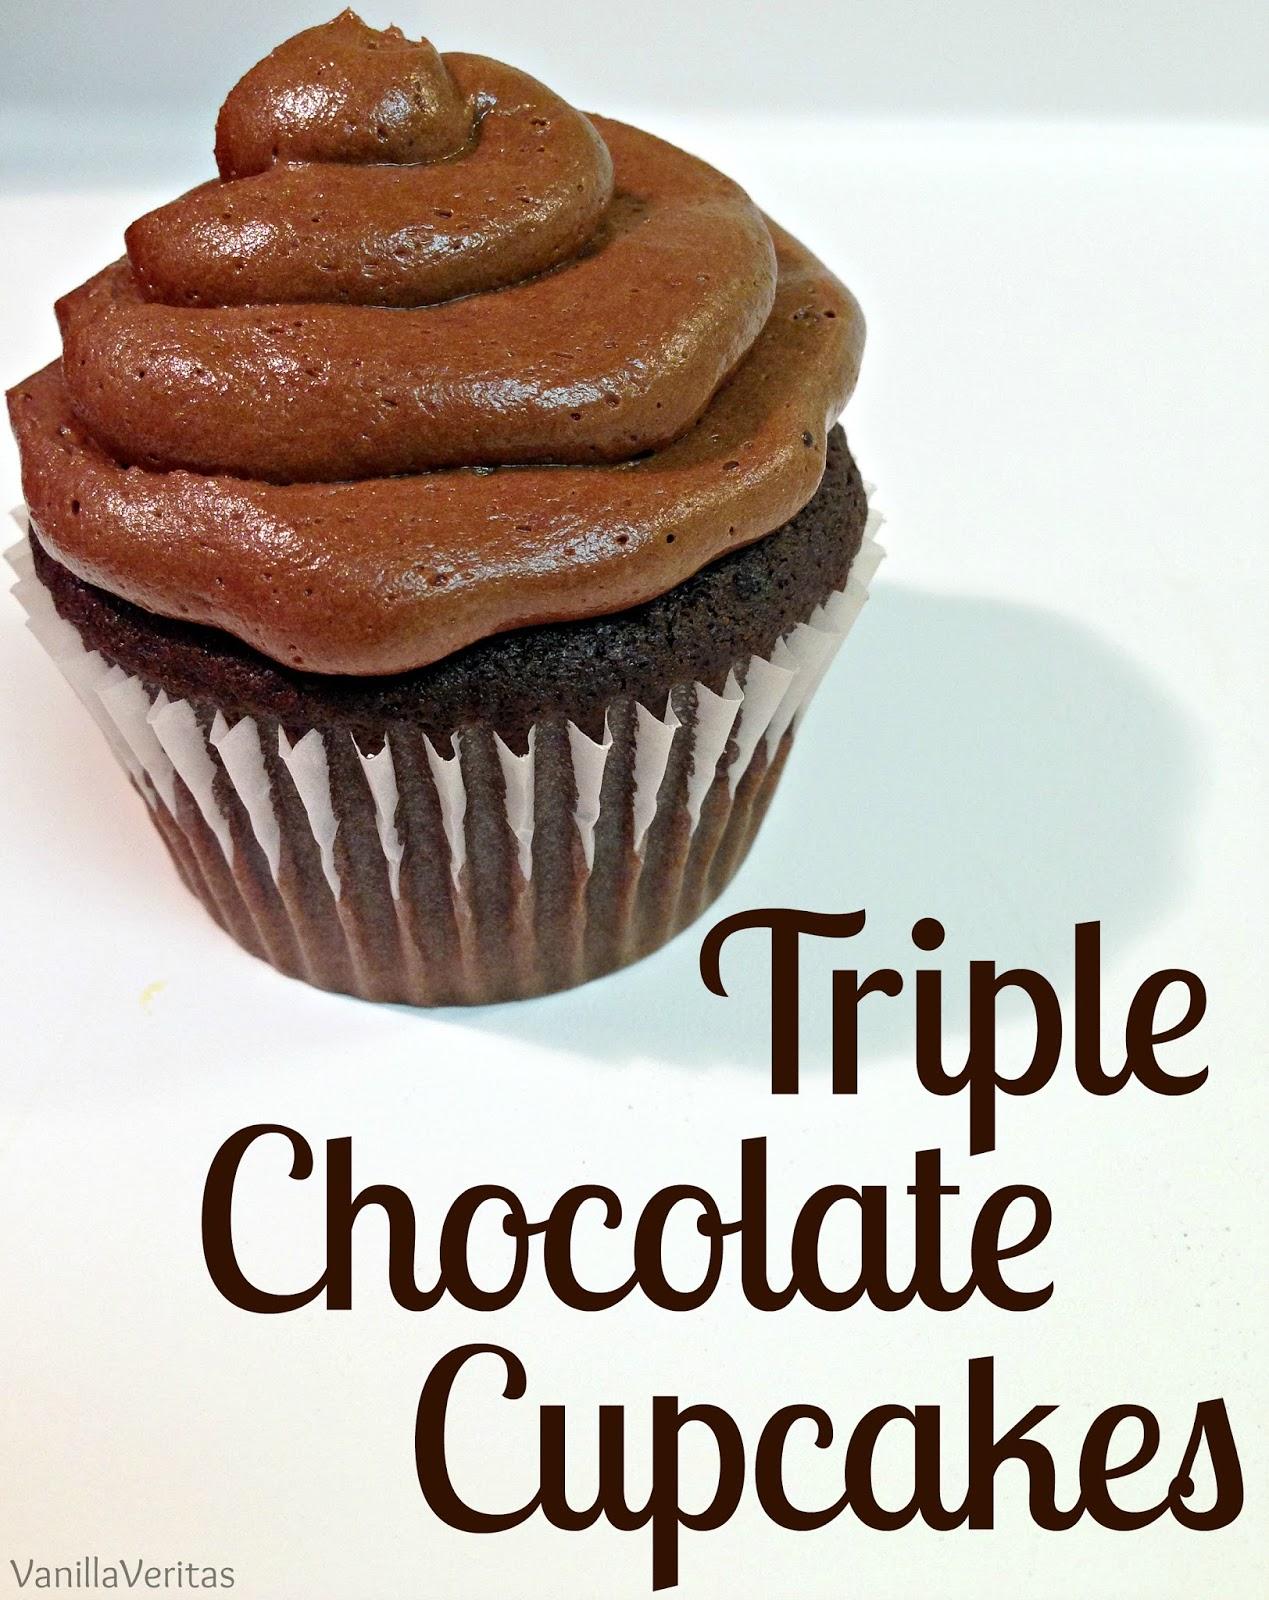 chocolate | cupcakes | cocoa | triple chocolate cupcakes | double chocolate | dutch chocolate | chocolate cupcake | death by chocolate | chocolate filling | ganache | buttercream | icing | frosting | cake | dessert | dark chocolate